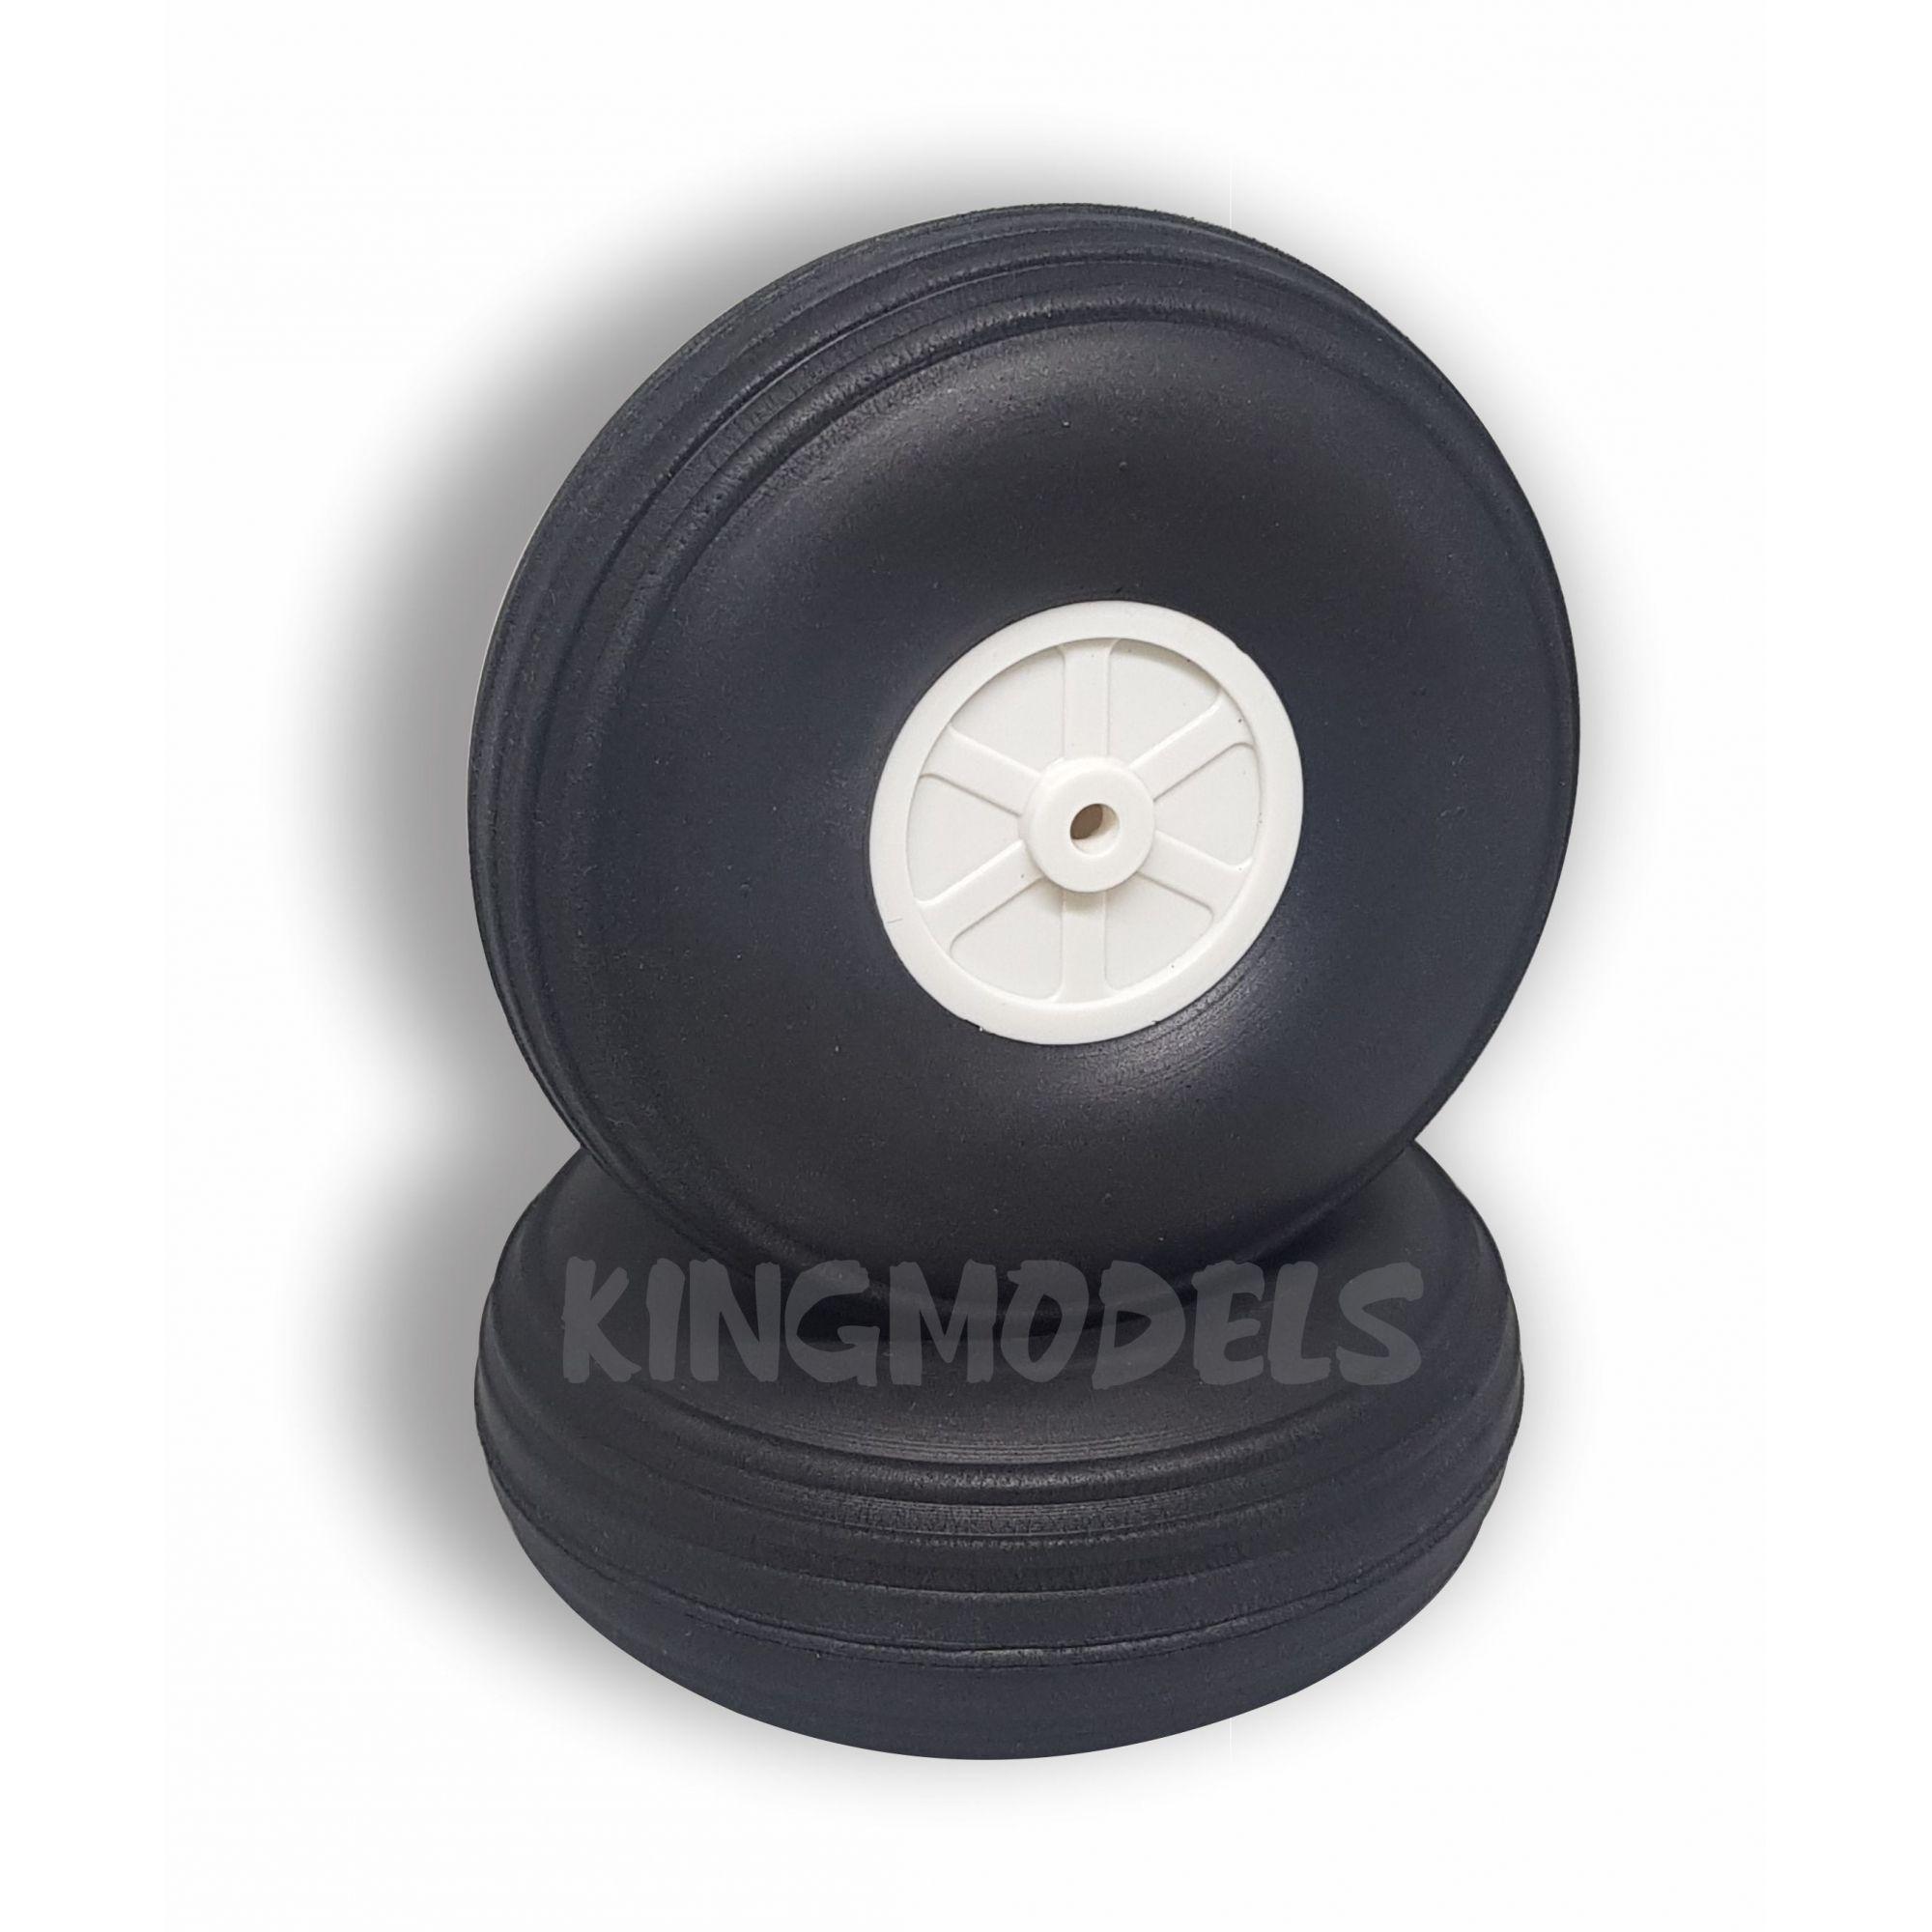 Roda De Borracha Extra-leve E Cubo Nylon- 76mm - Unidade  - King Models